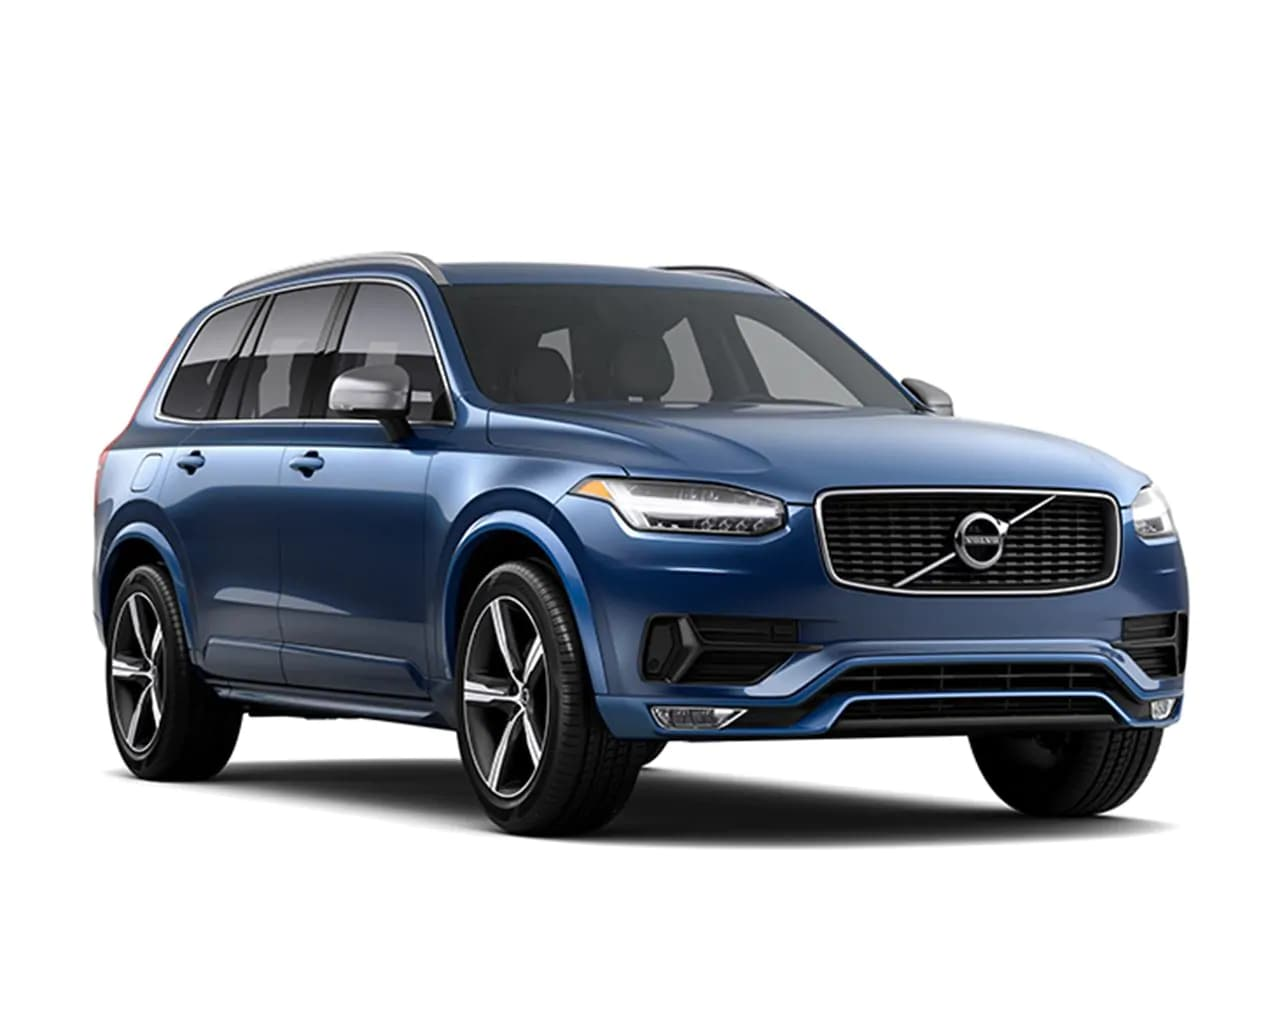 Volvo Of Tempe >> Locate A Volvo Dealer Near Tempe Az